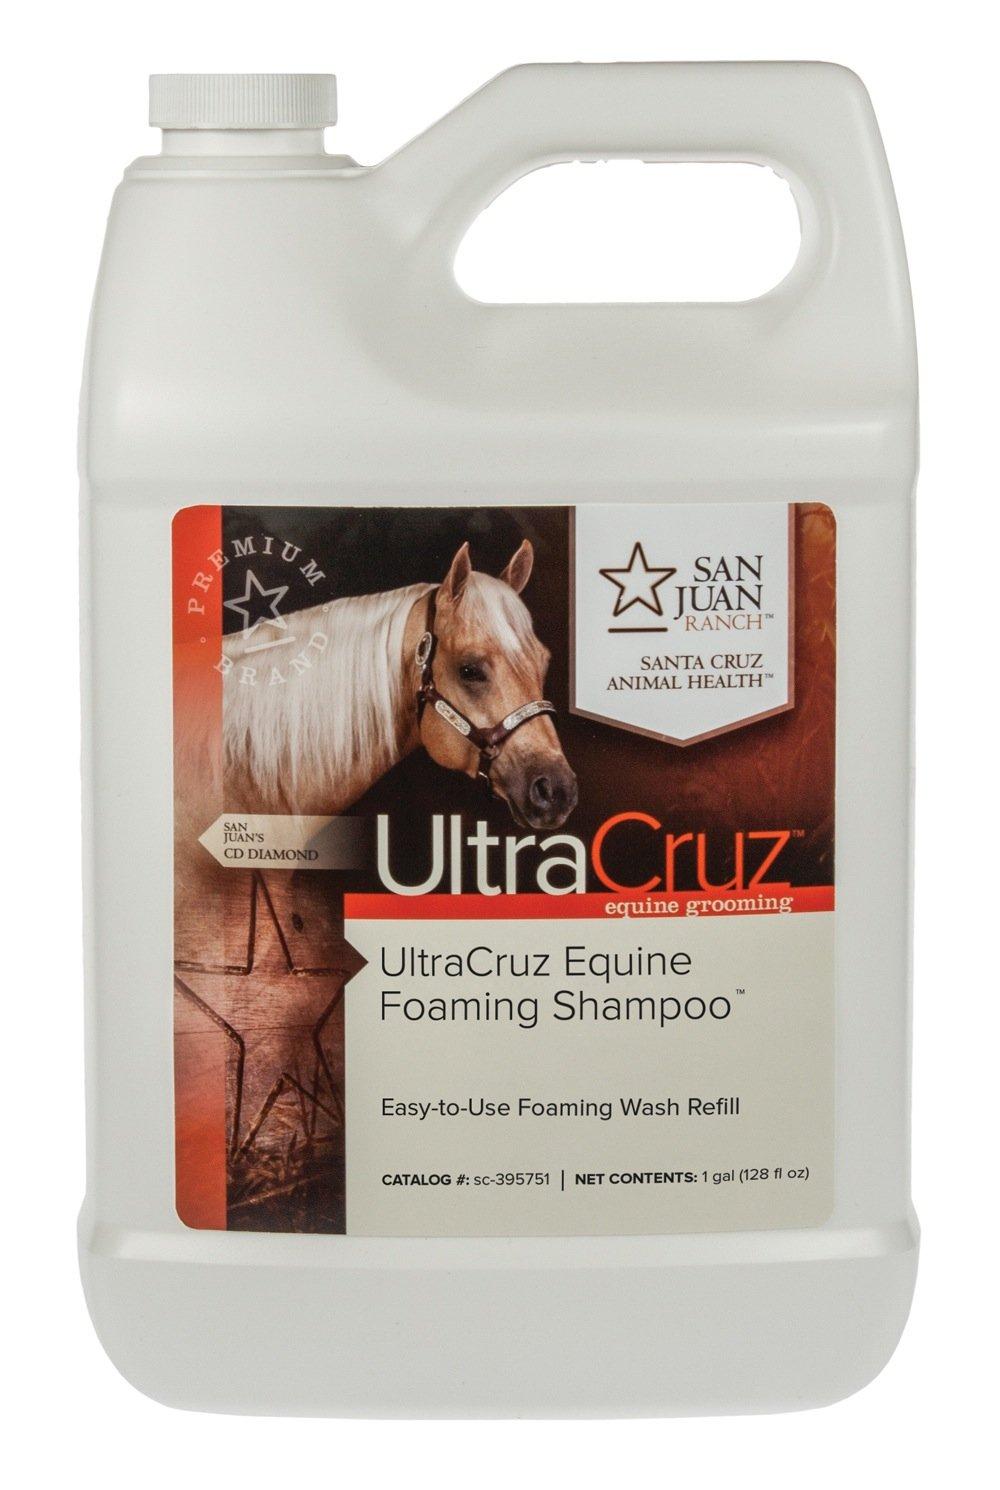 UltraCruz Equine Foaming Horse Shampoo, 1 gal Refill